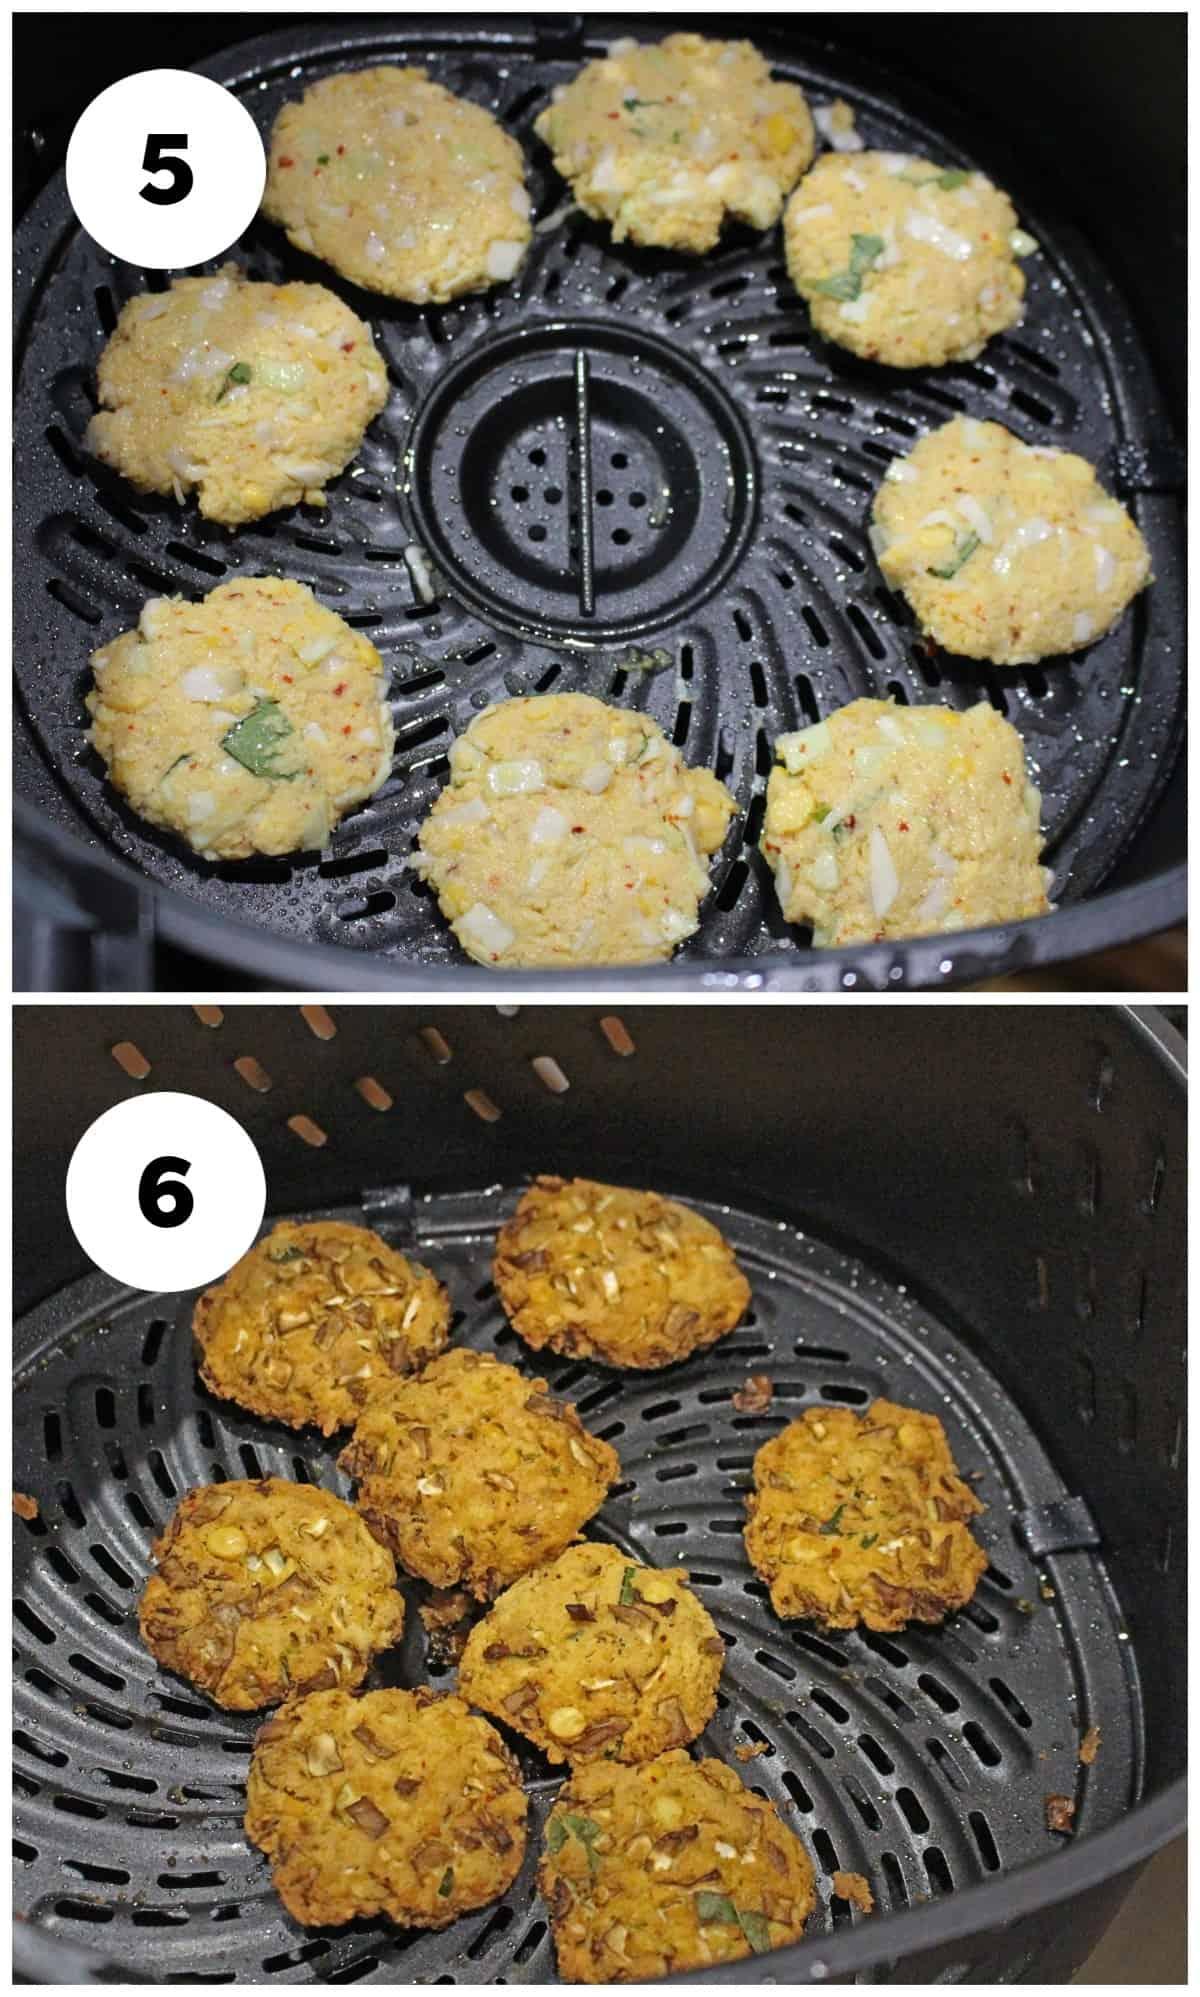 frying the lentil fritter in air fryer